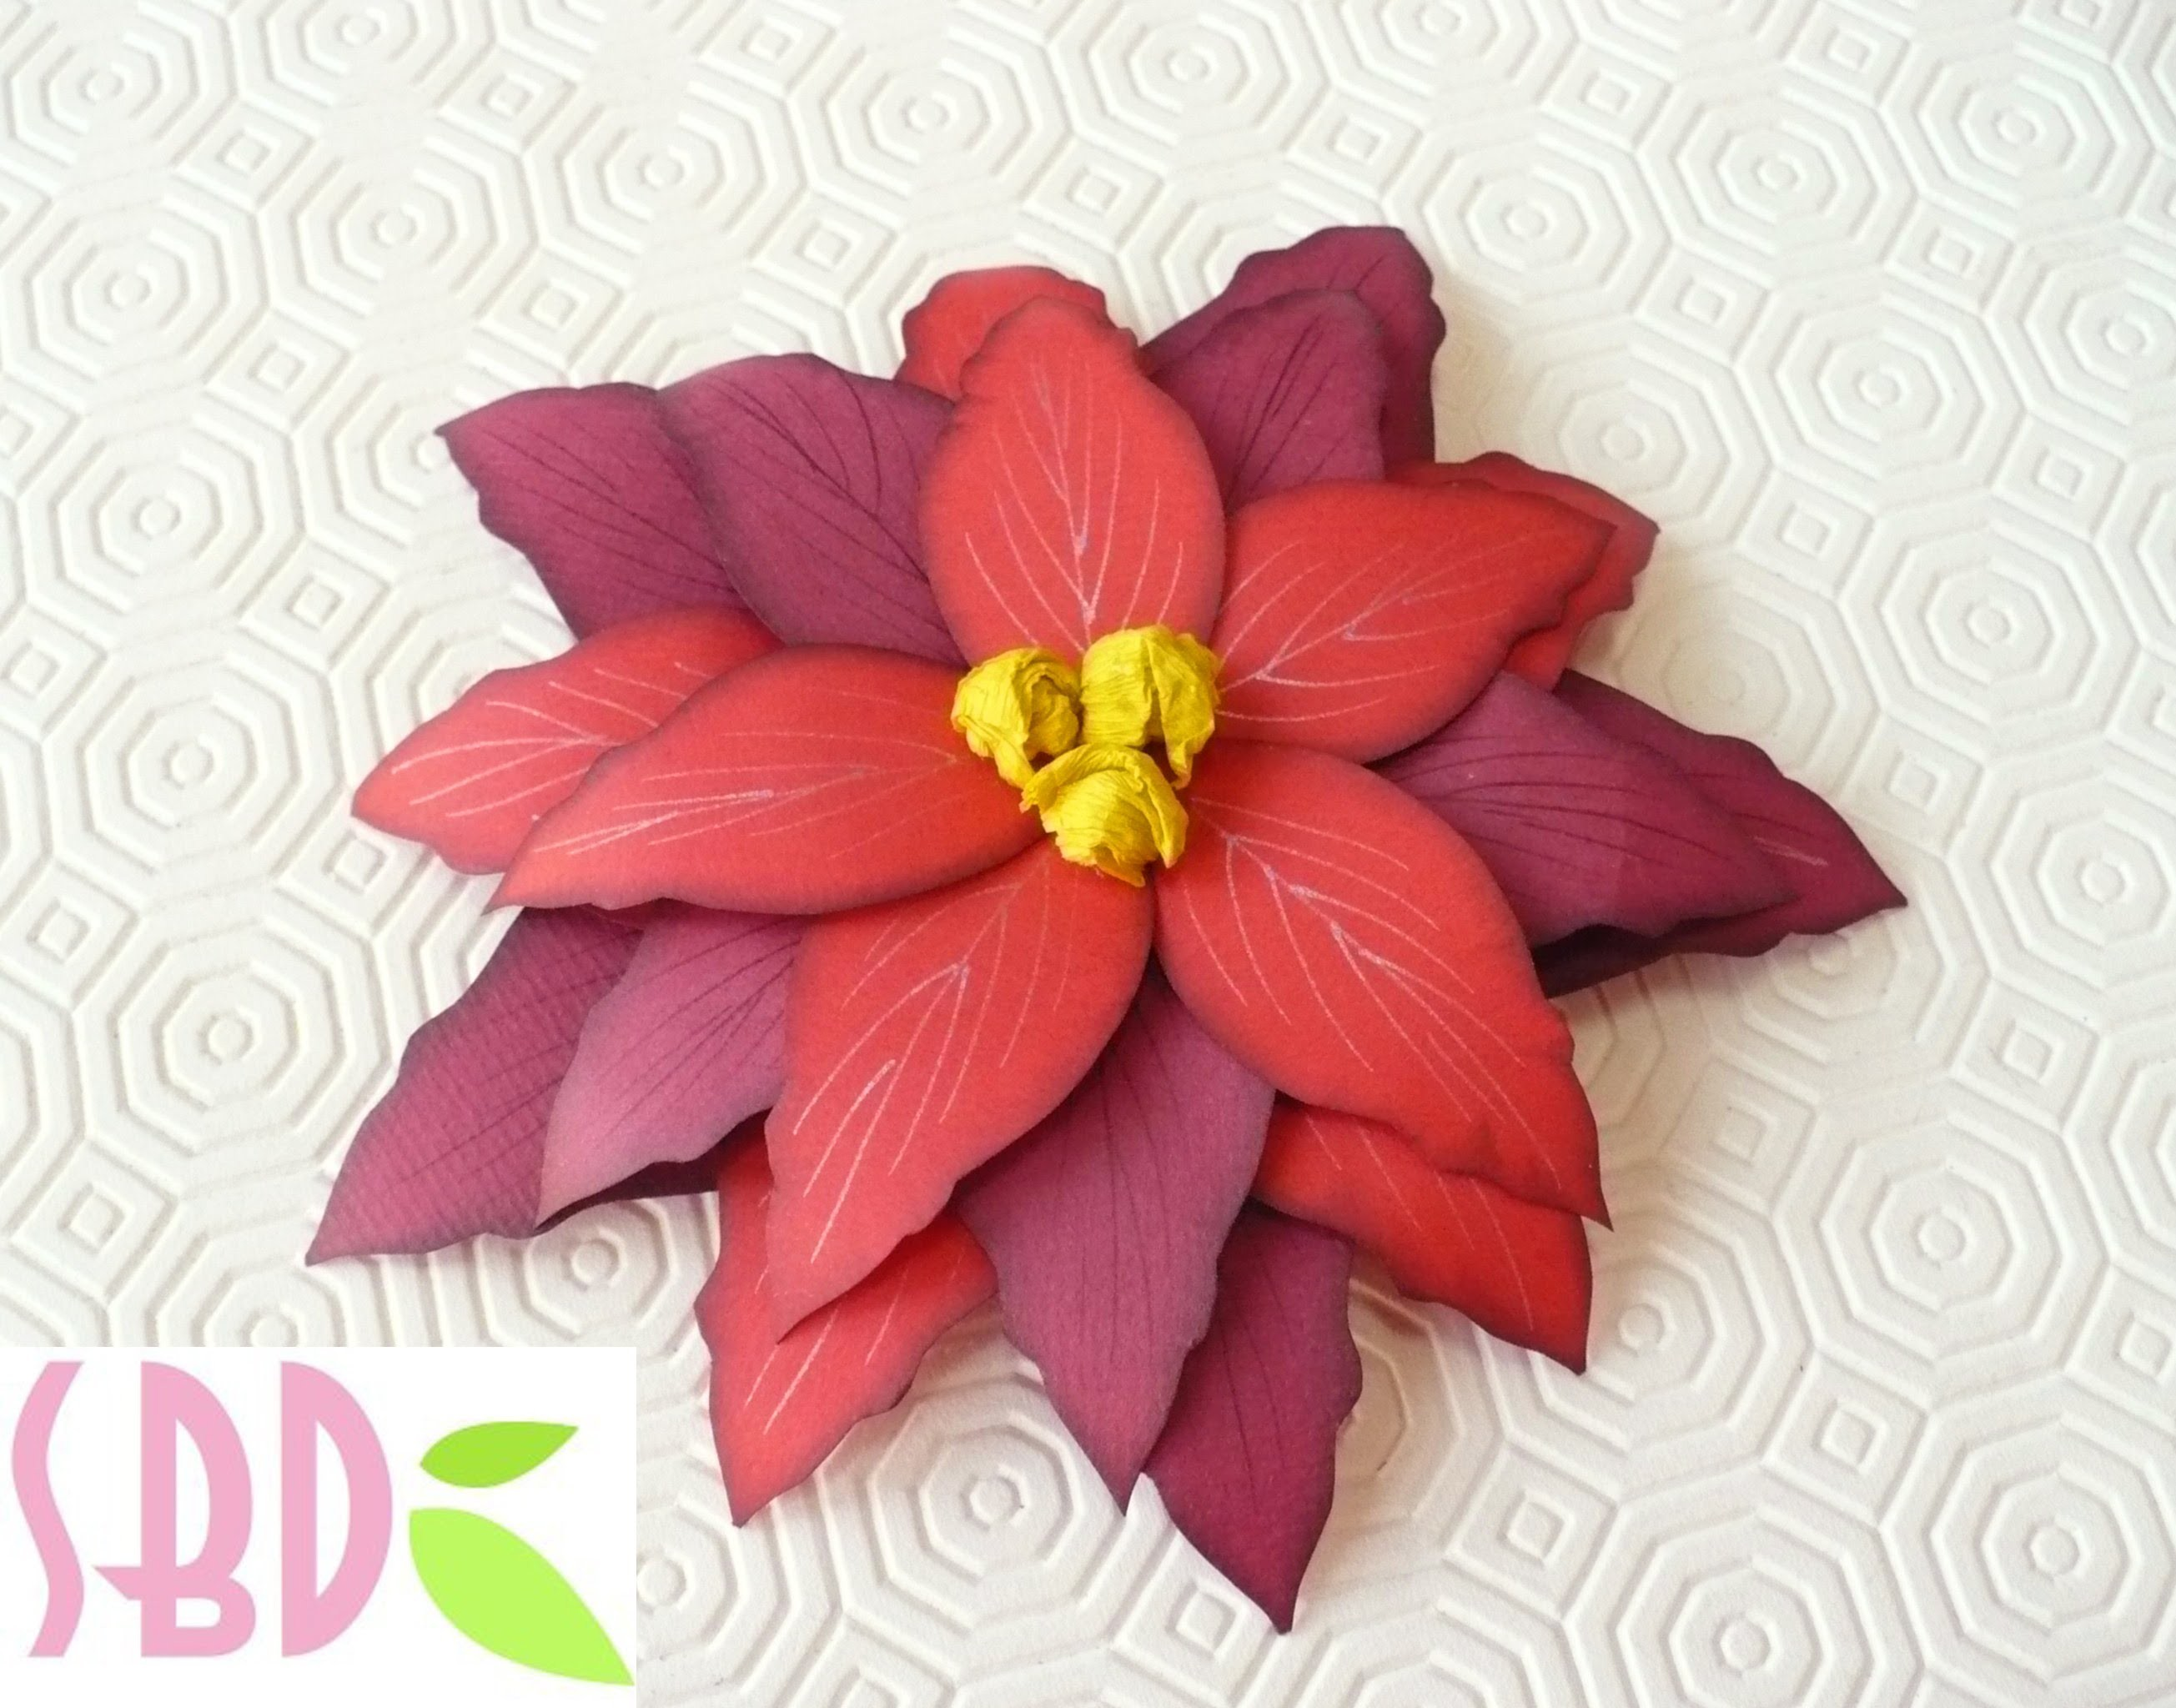 Scrapbooking tutorial: Stella di Natale di carta - Paper Christmas flower